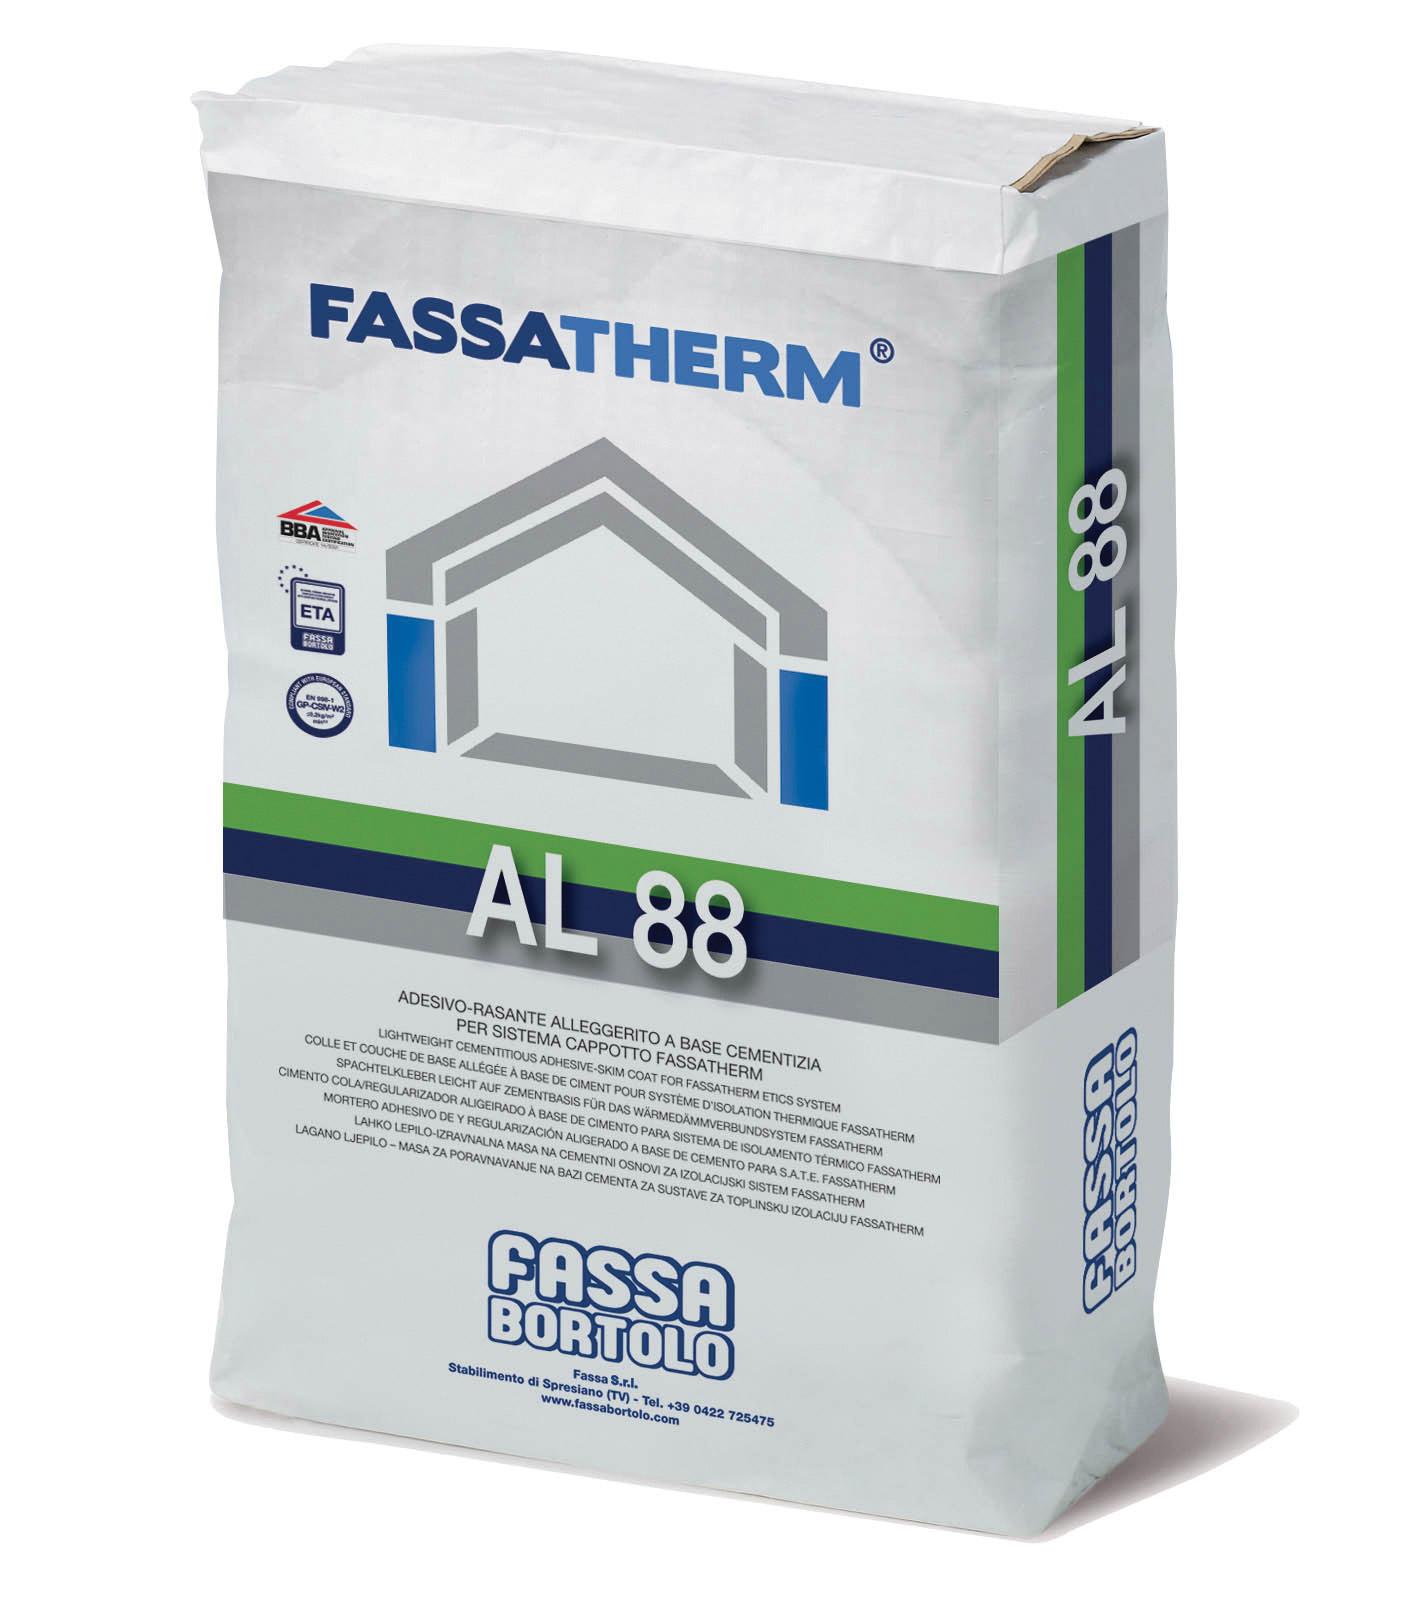 AL 88: Cola-Regularizador aligeirado de base cimentícia branca para Sistemas Fassatherm®